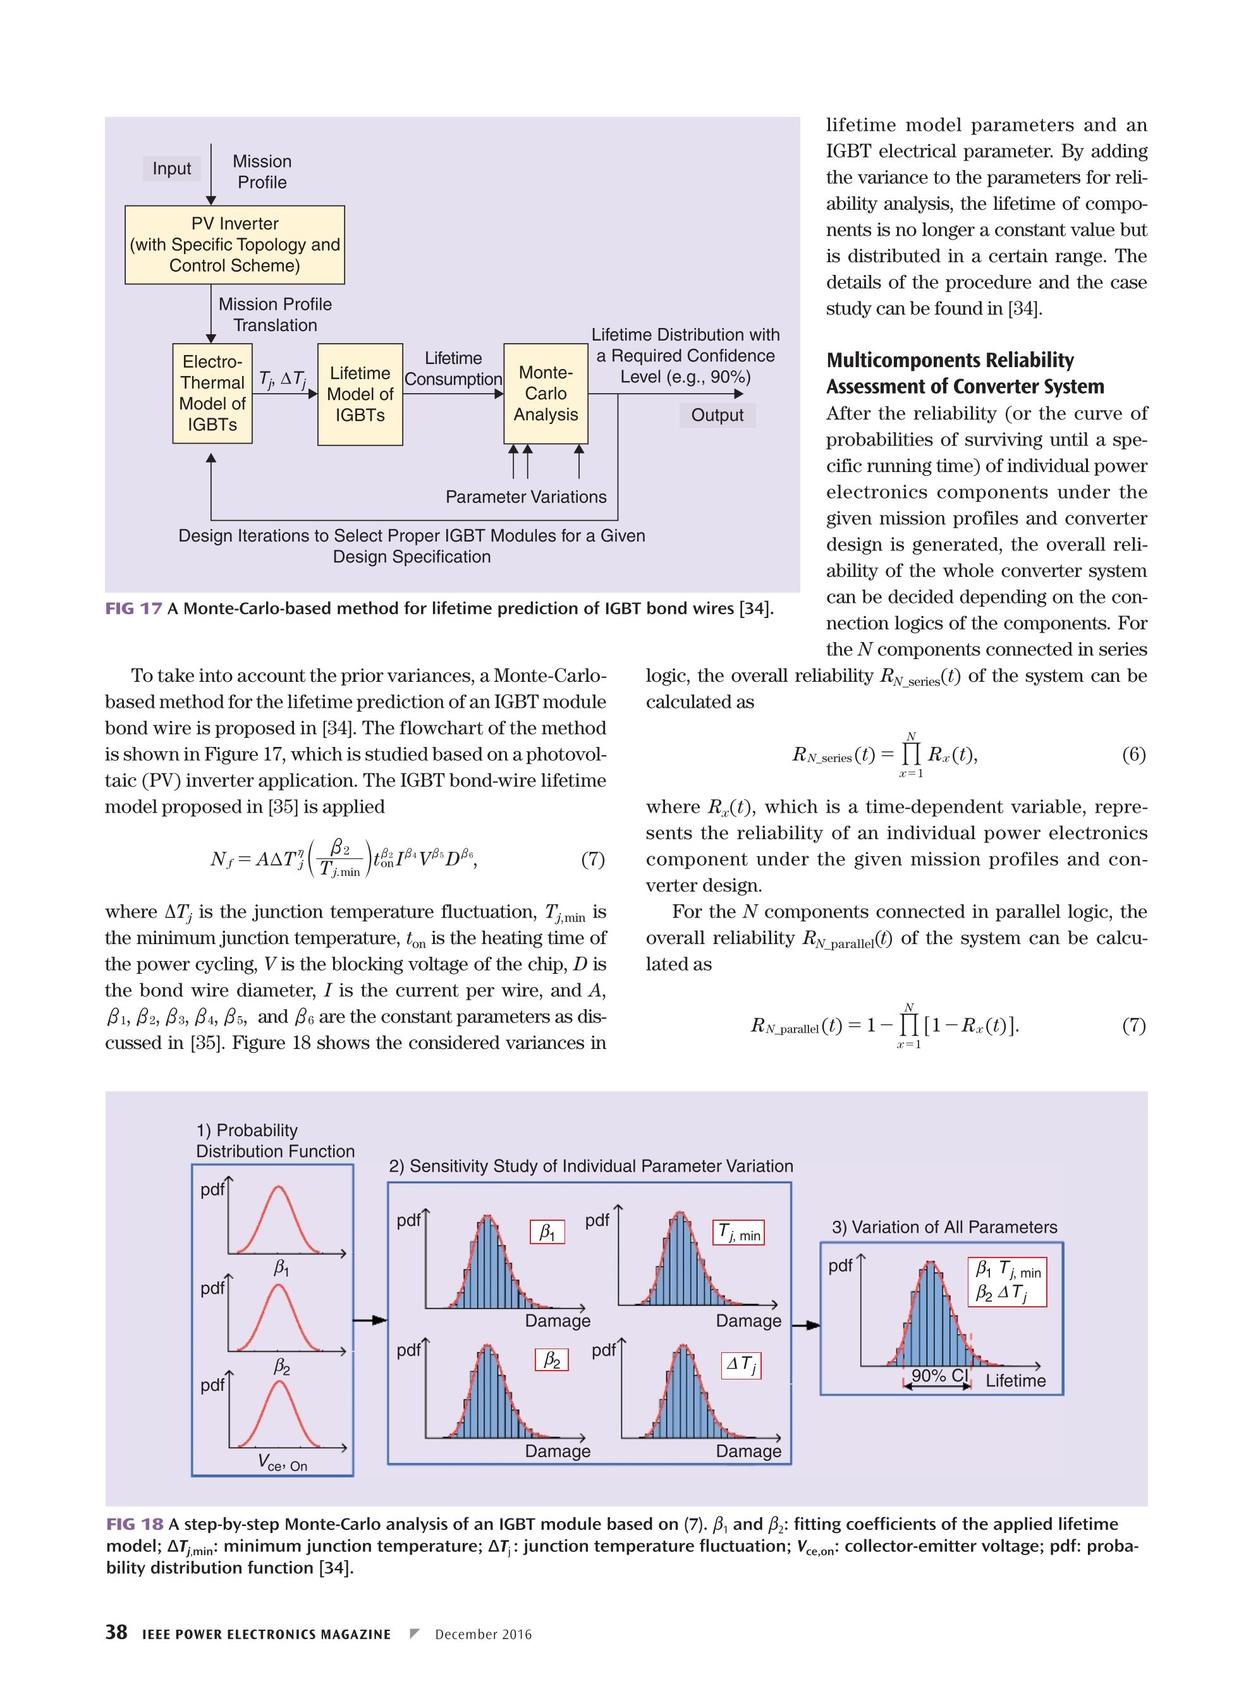 IEEE Power Electronics Magazine - December 2016